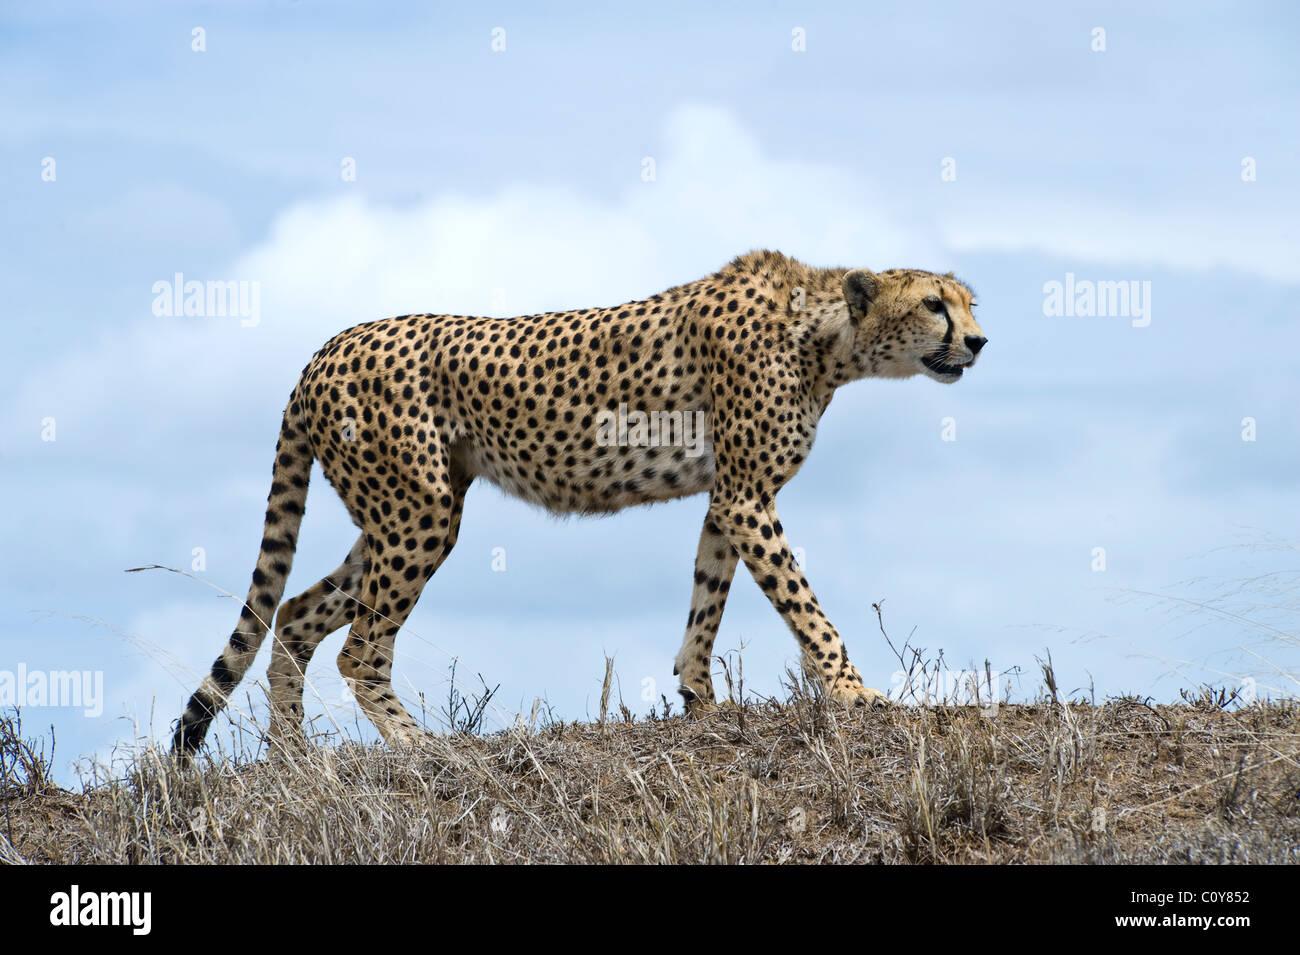 Female cheetah, Acinonyx jubatus, searching for prey, Simba Kopjes, Serengeti, Tanzania - Stock Image